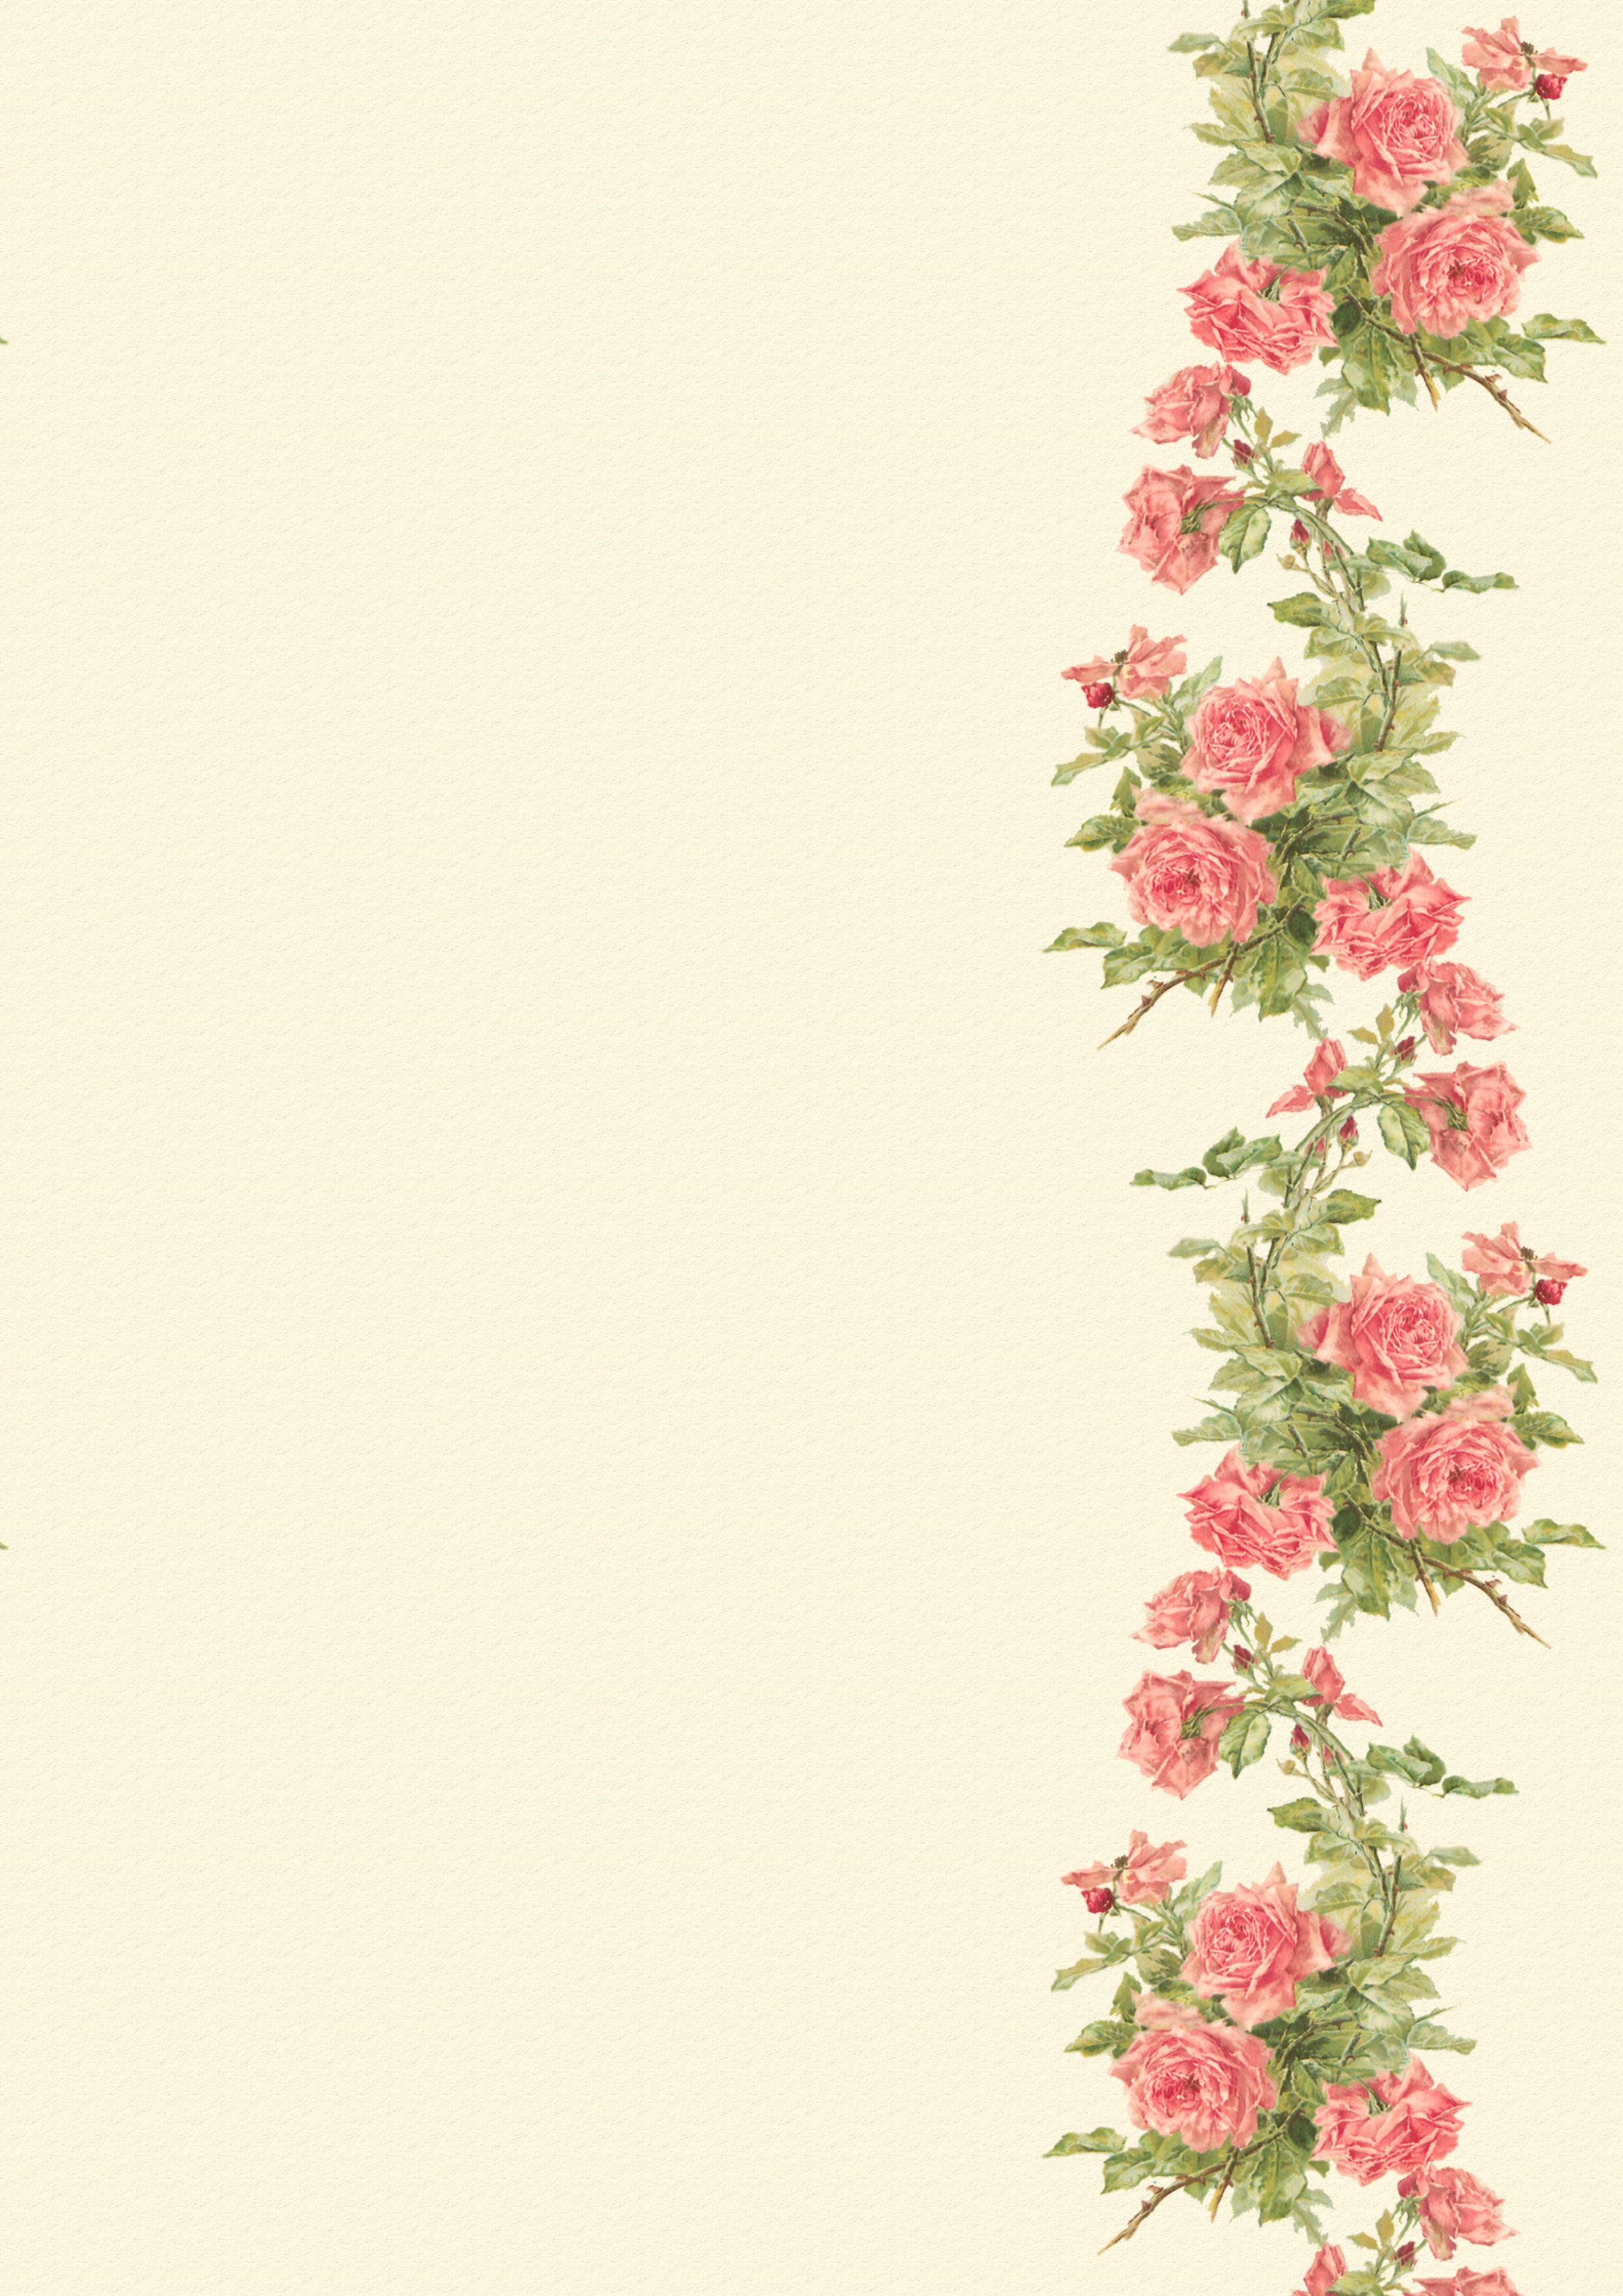 Catherine klein peach roses digital elements wings of - Peach rose wallpaper ...